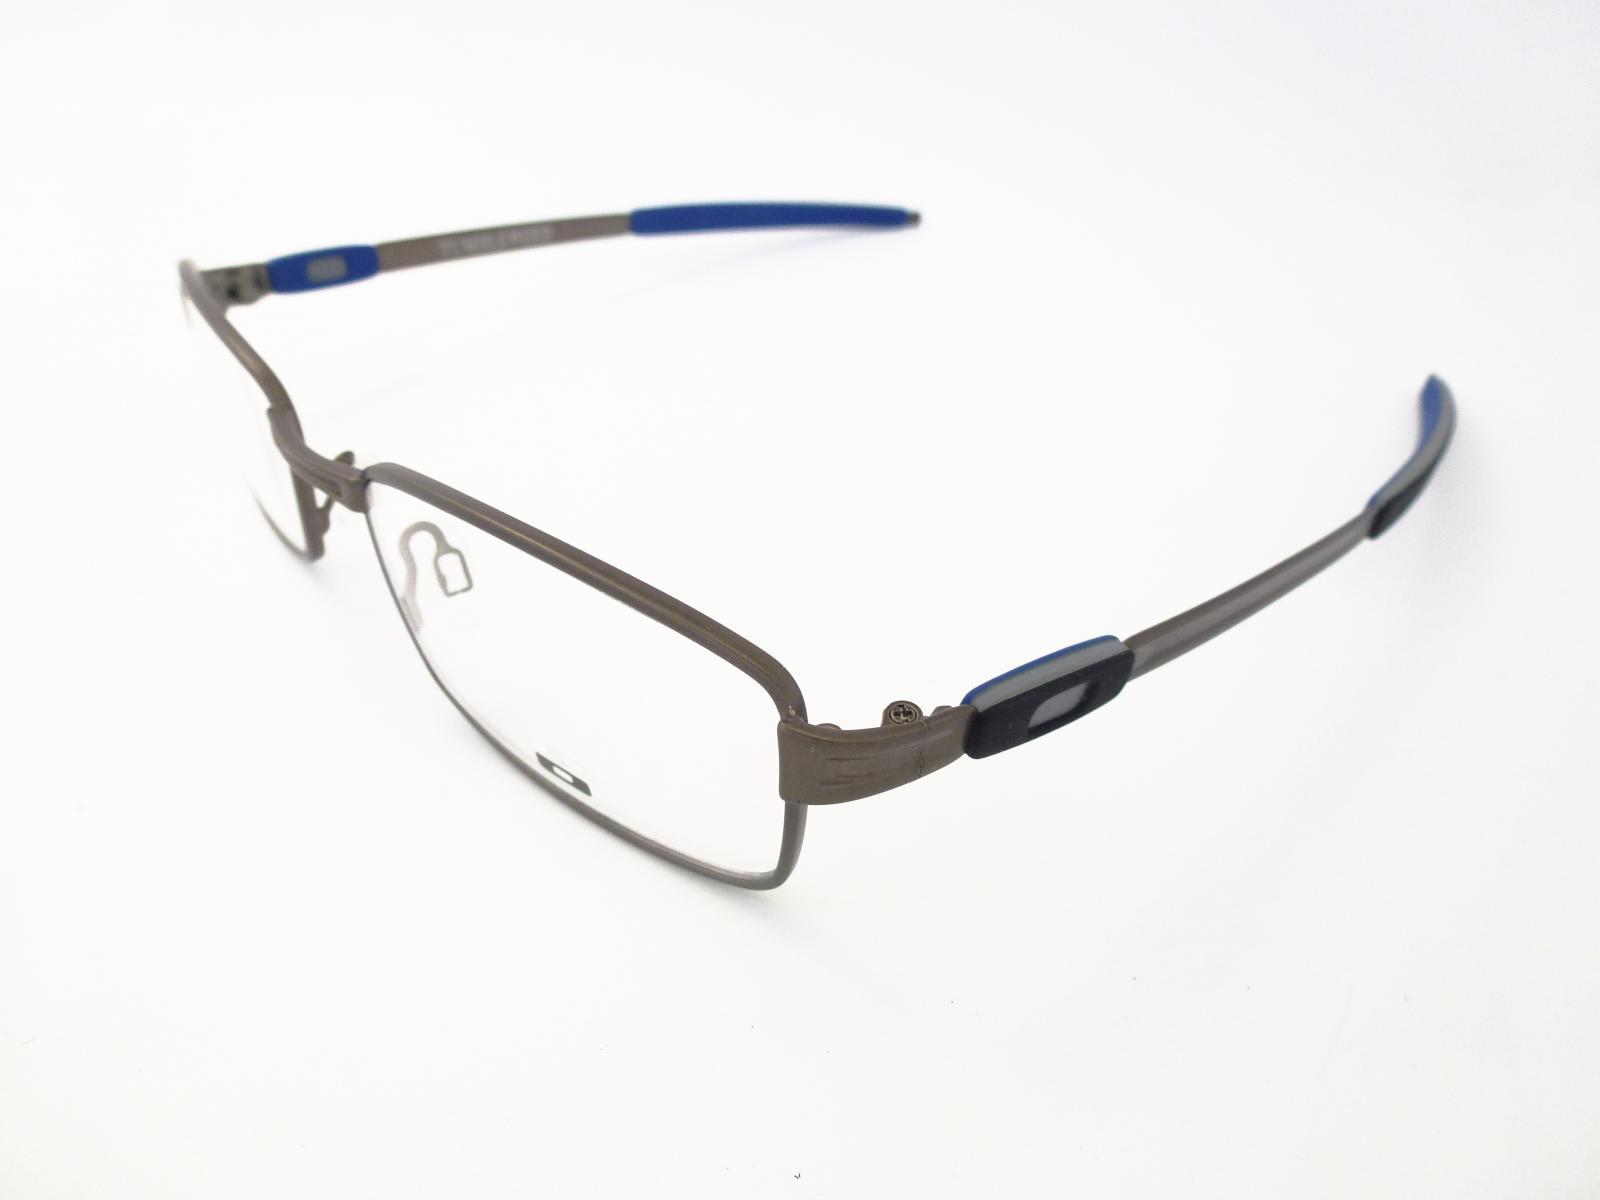 49731d4a60c6 Oakley Reading Glasses Ebay « Heritage Malta